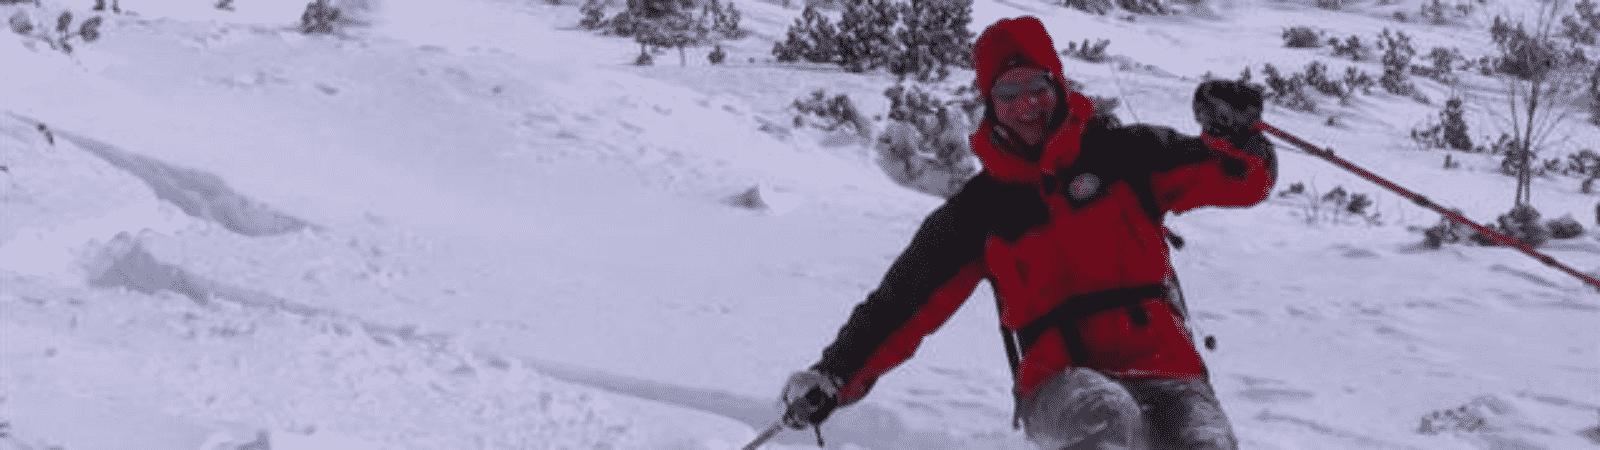 Freeride skiing in Vogel, inside Triglav National Park